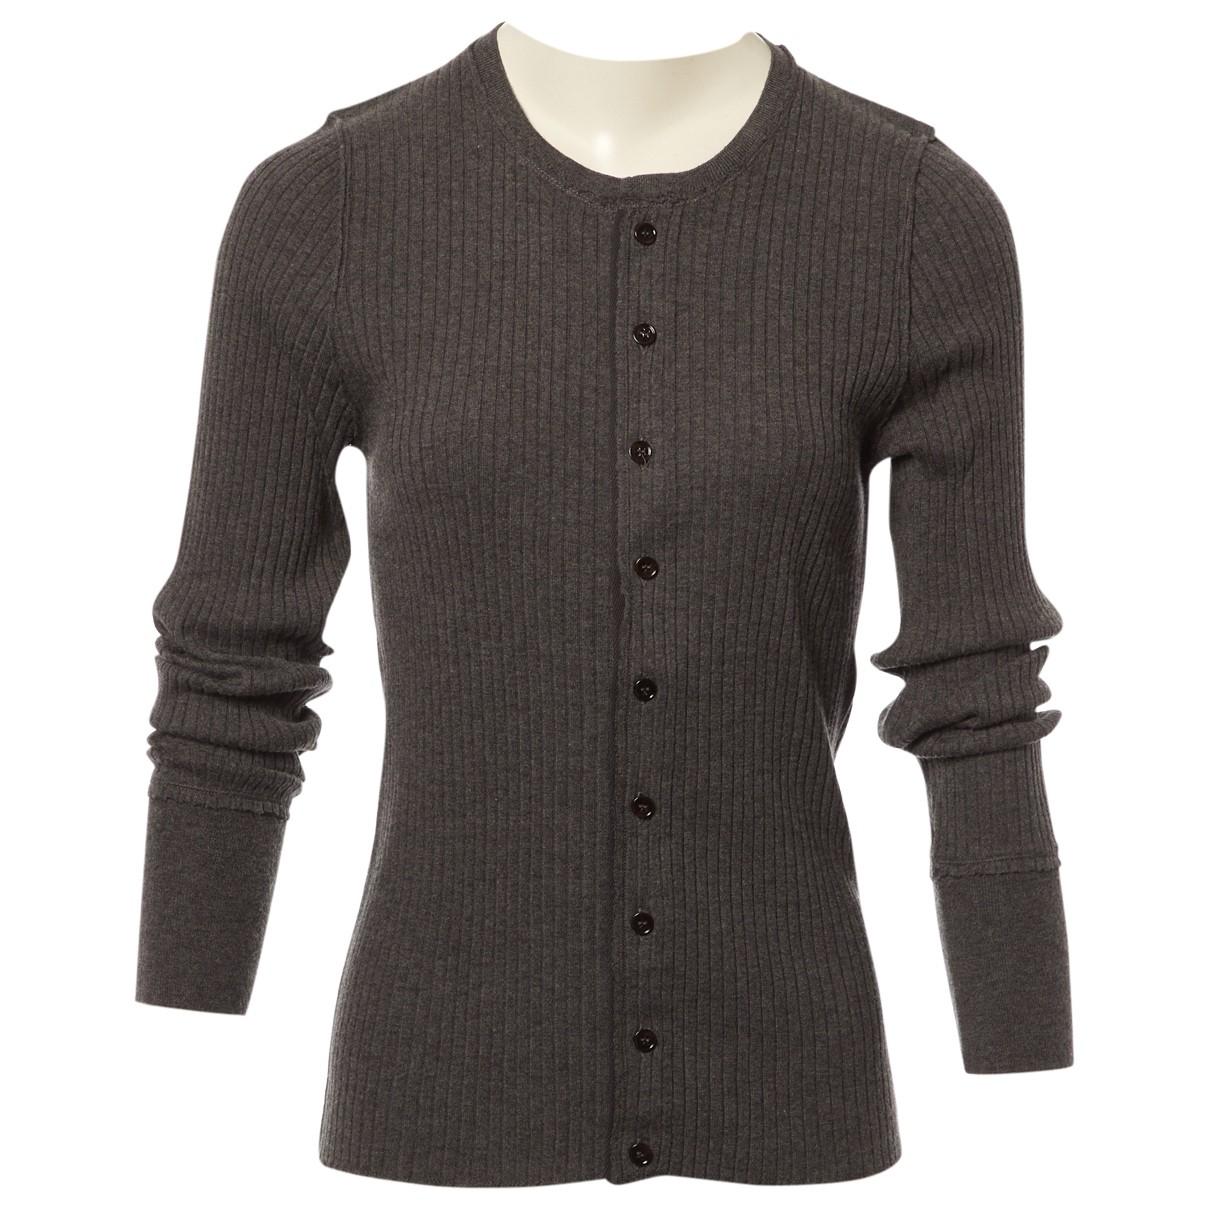 Dolce & Gabbana \N Grey Cashmere Knitwear & Sweatshirts for Men 48 IT